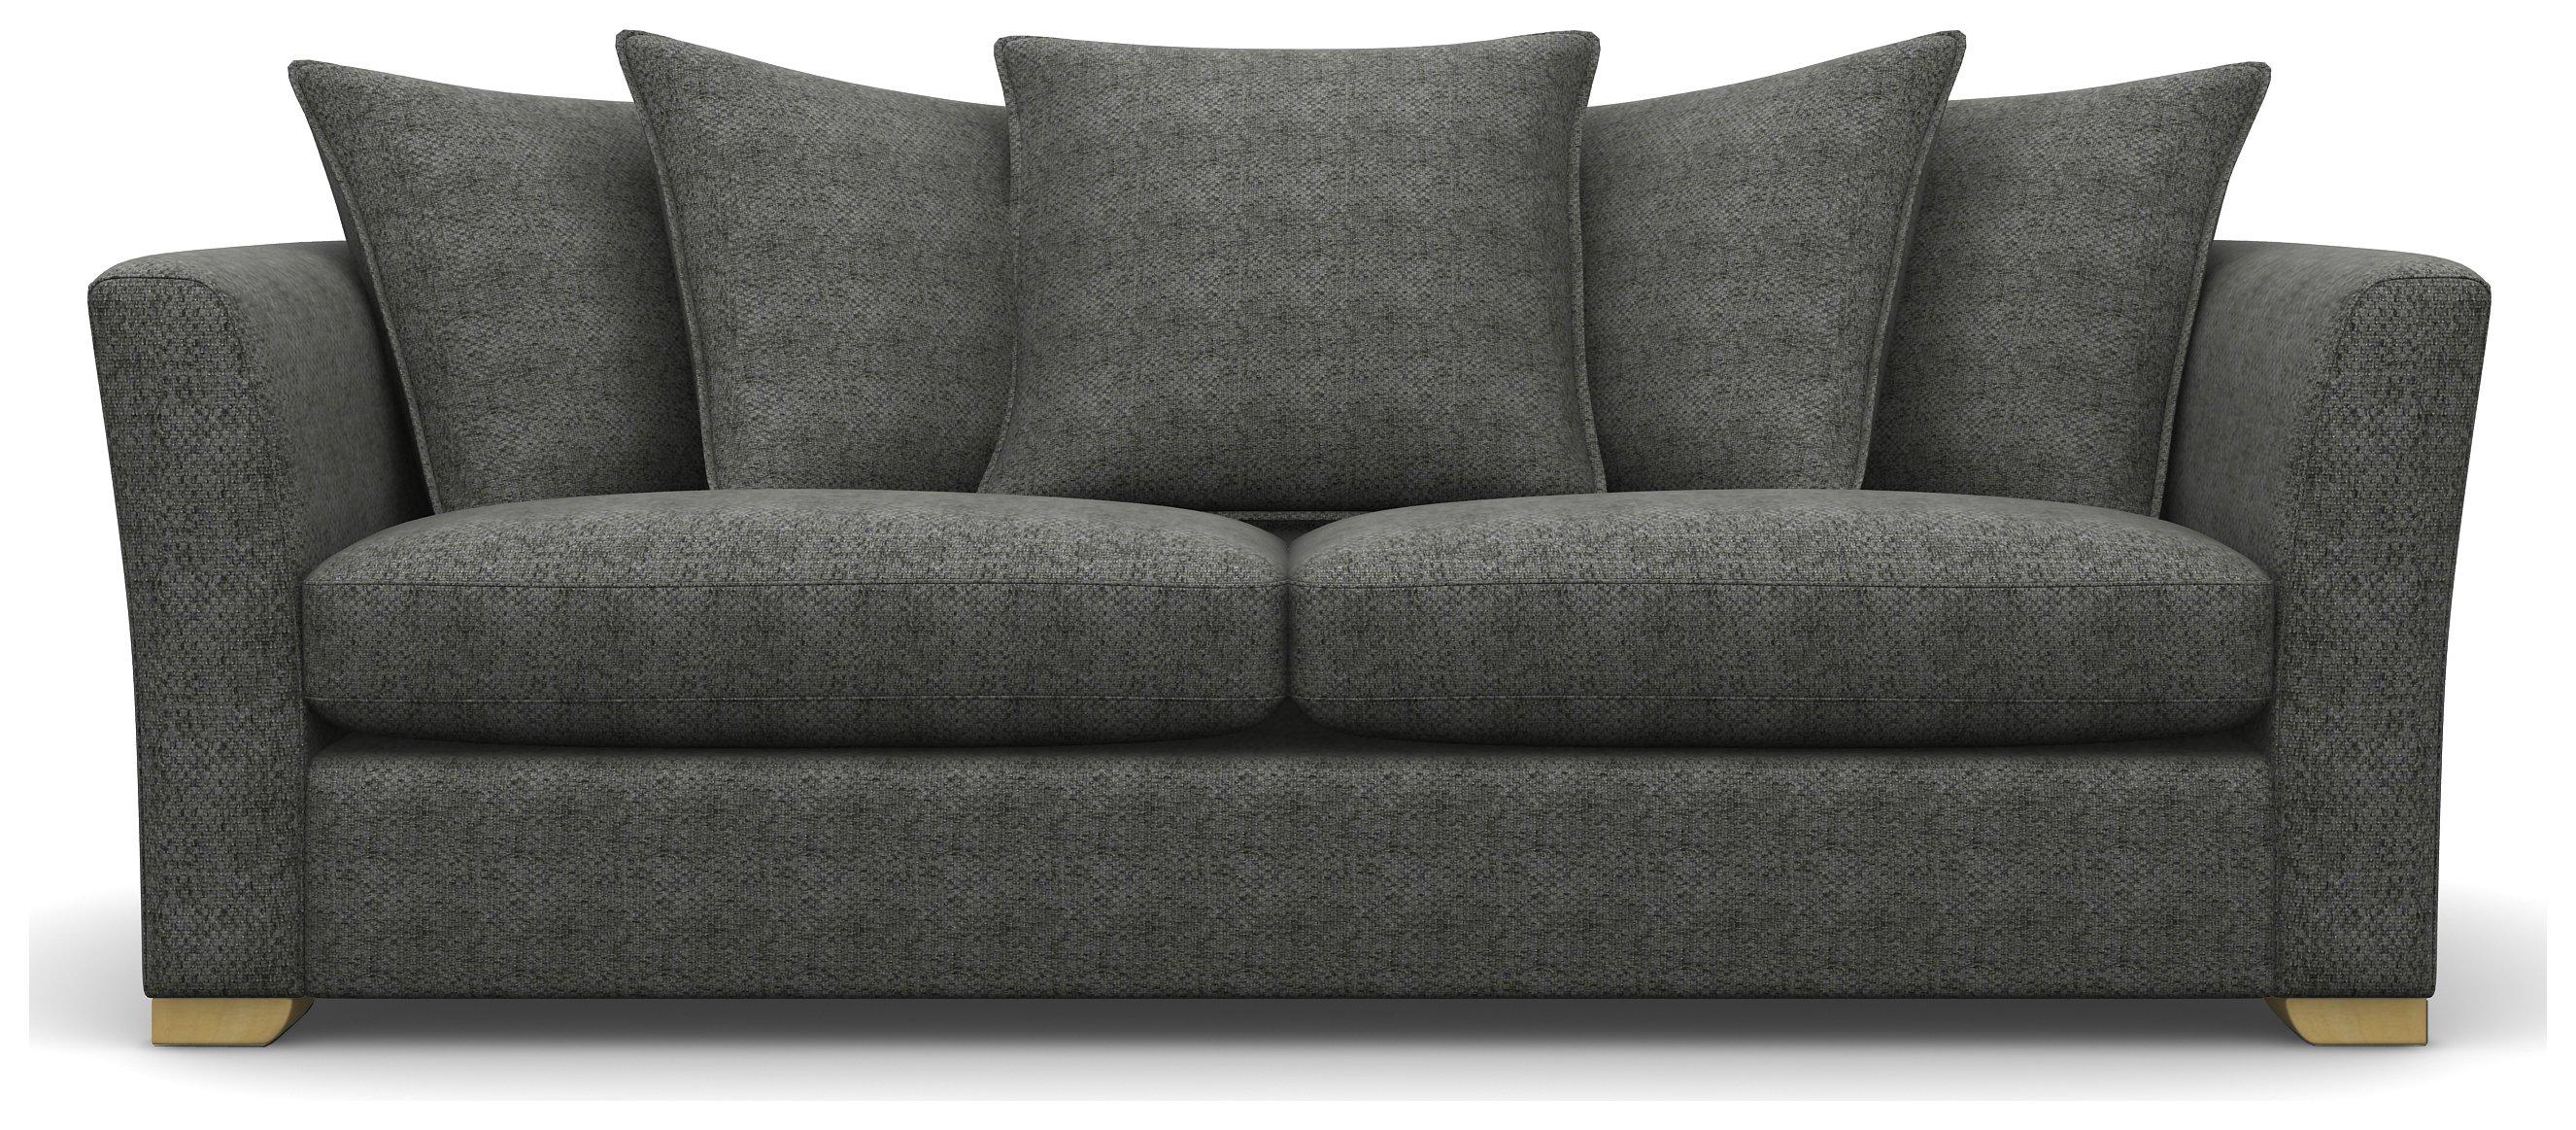 Heart of House Libby 3 Seater Fabric Sofa - Grey